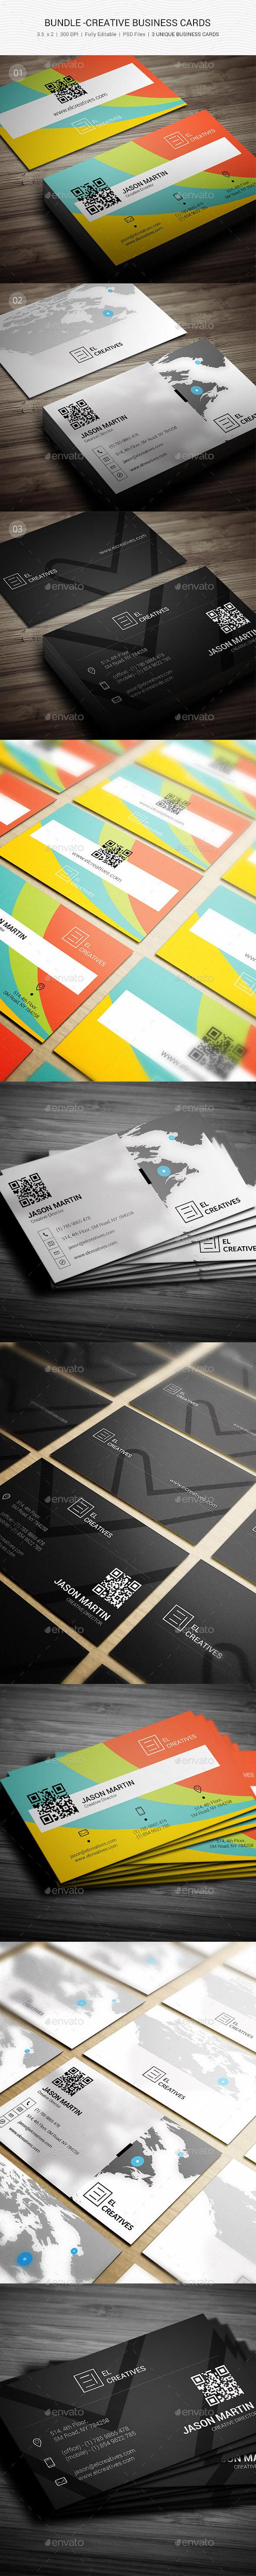 GraphicRiver Bundle Creative Busienss Cards 103 11246499